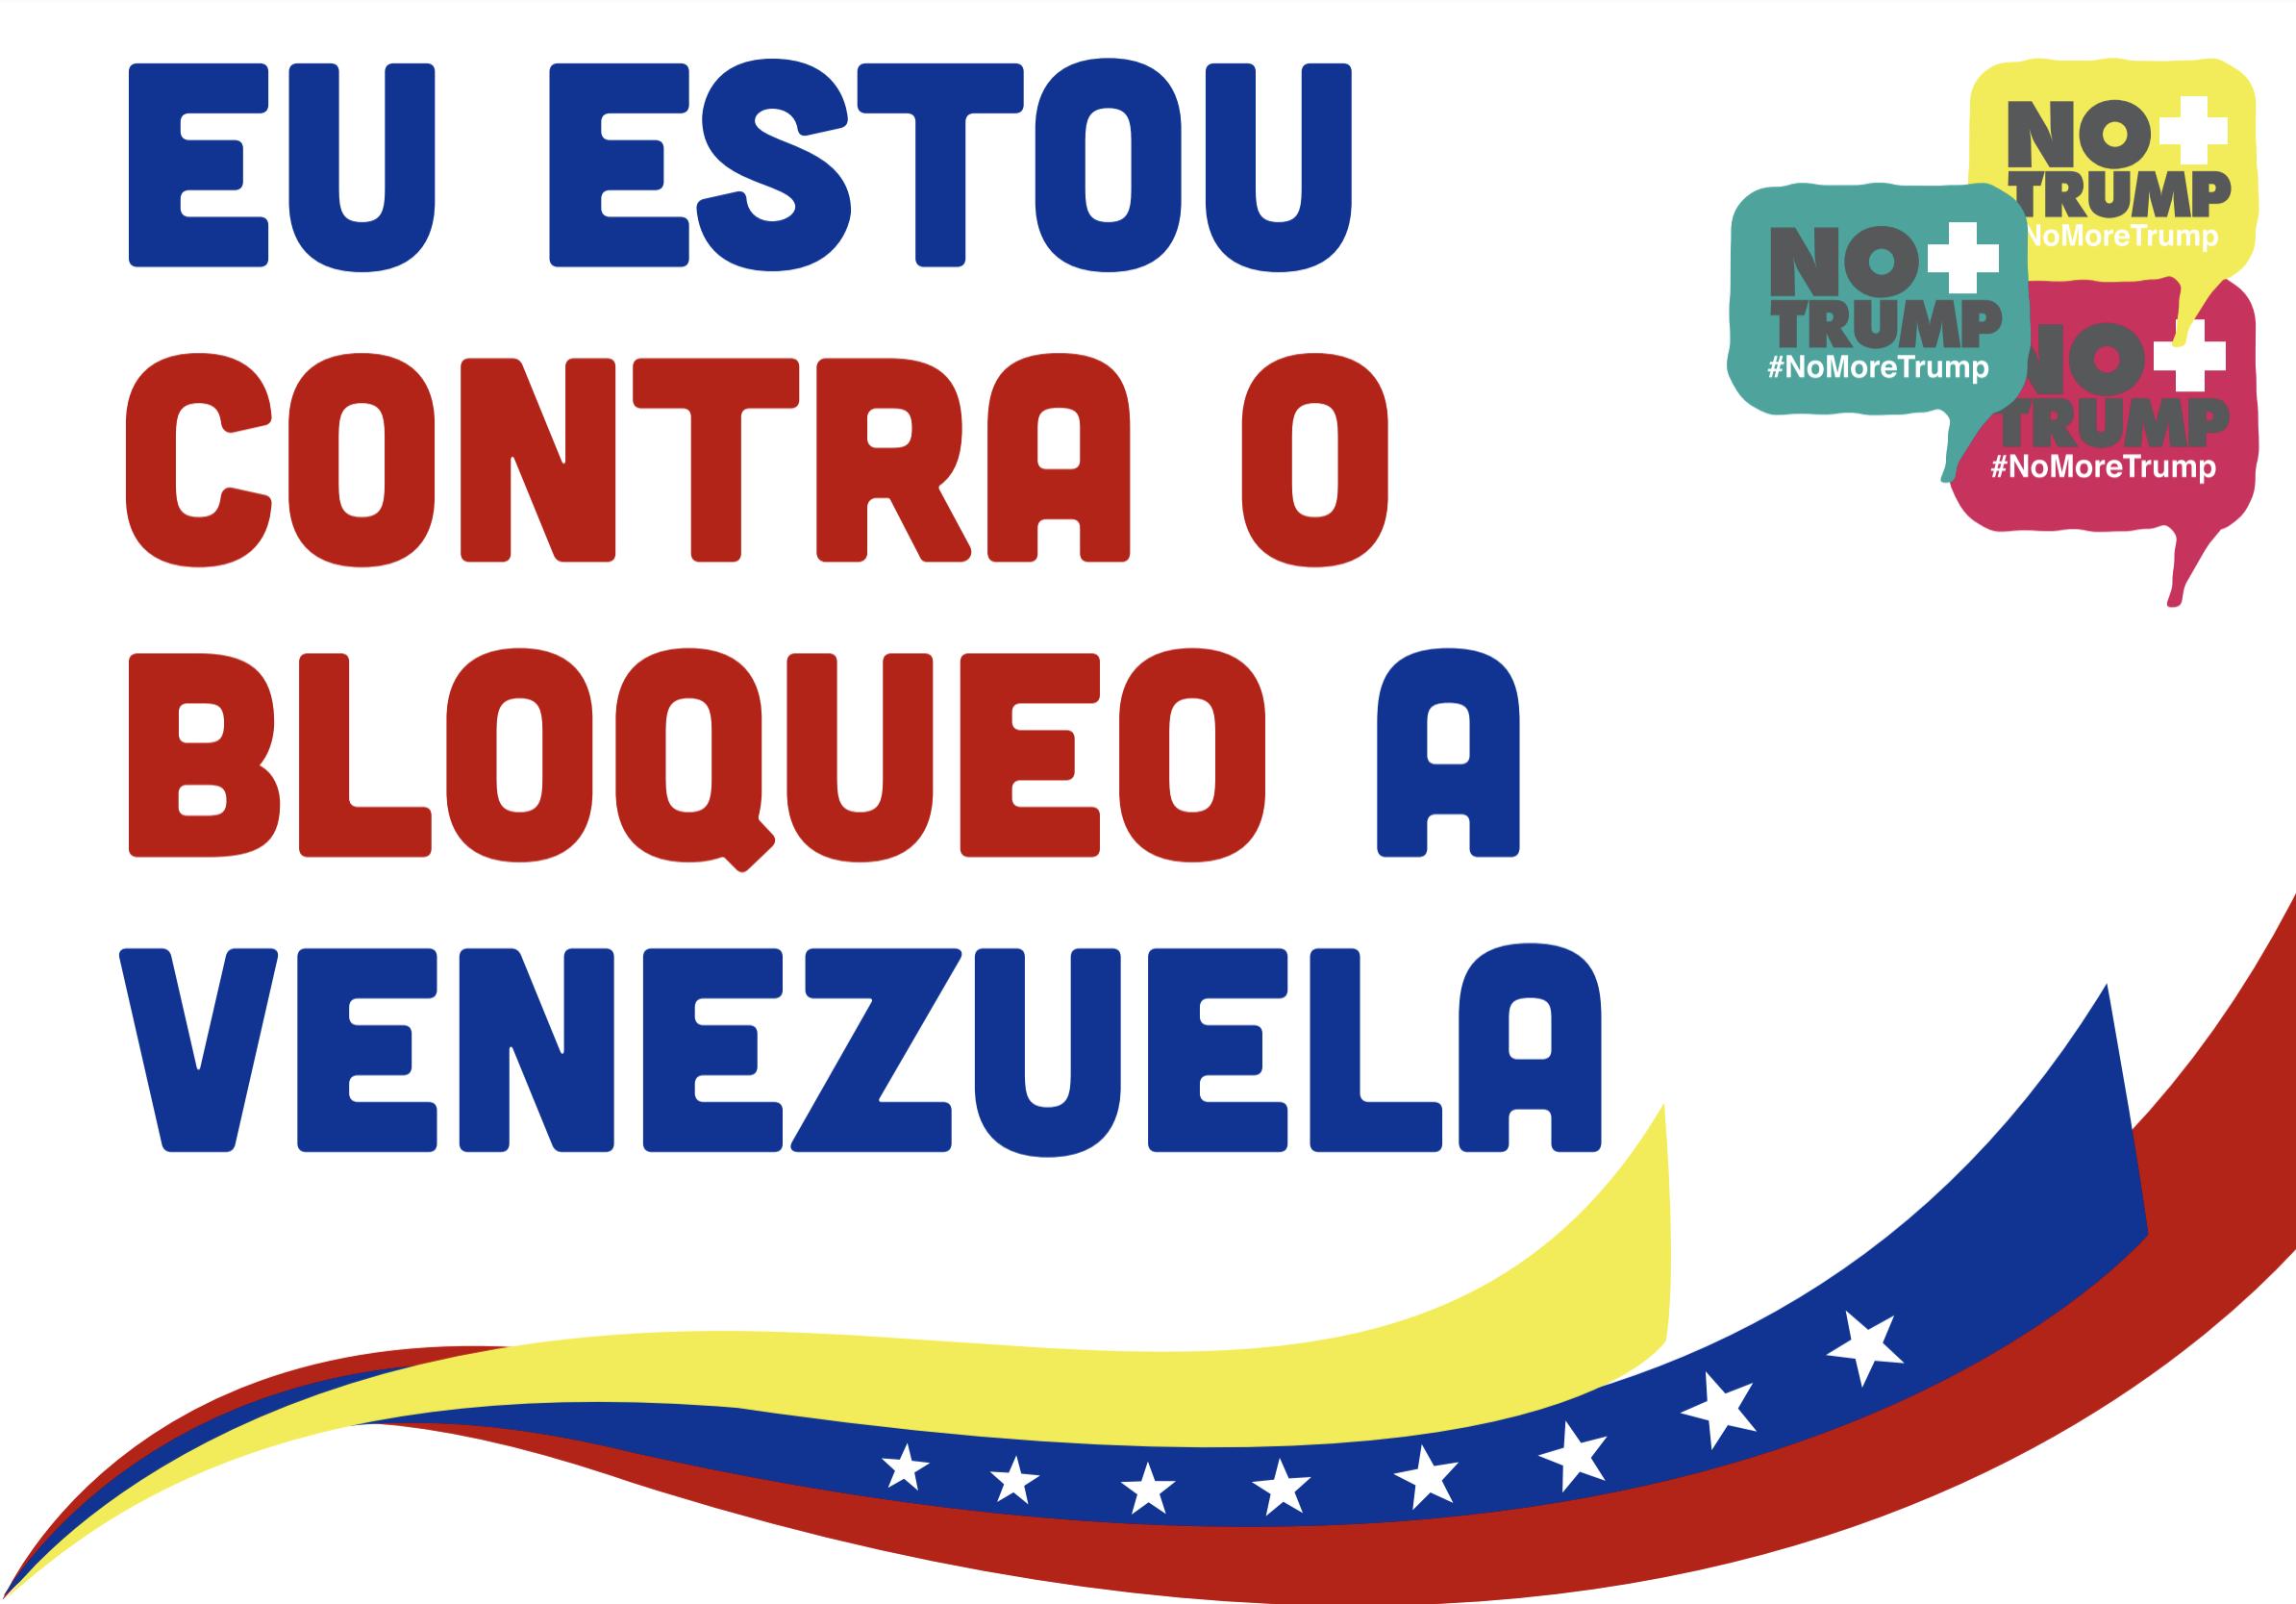 Contra bloqueo Venezuela